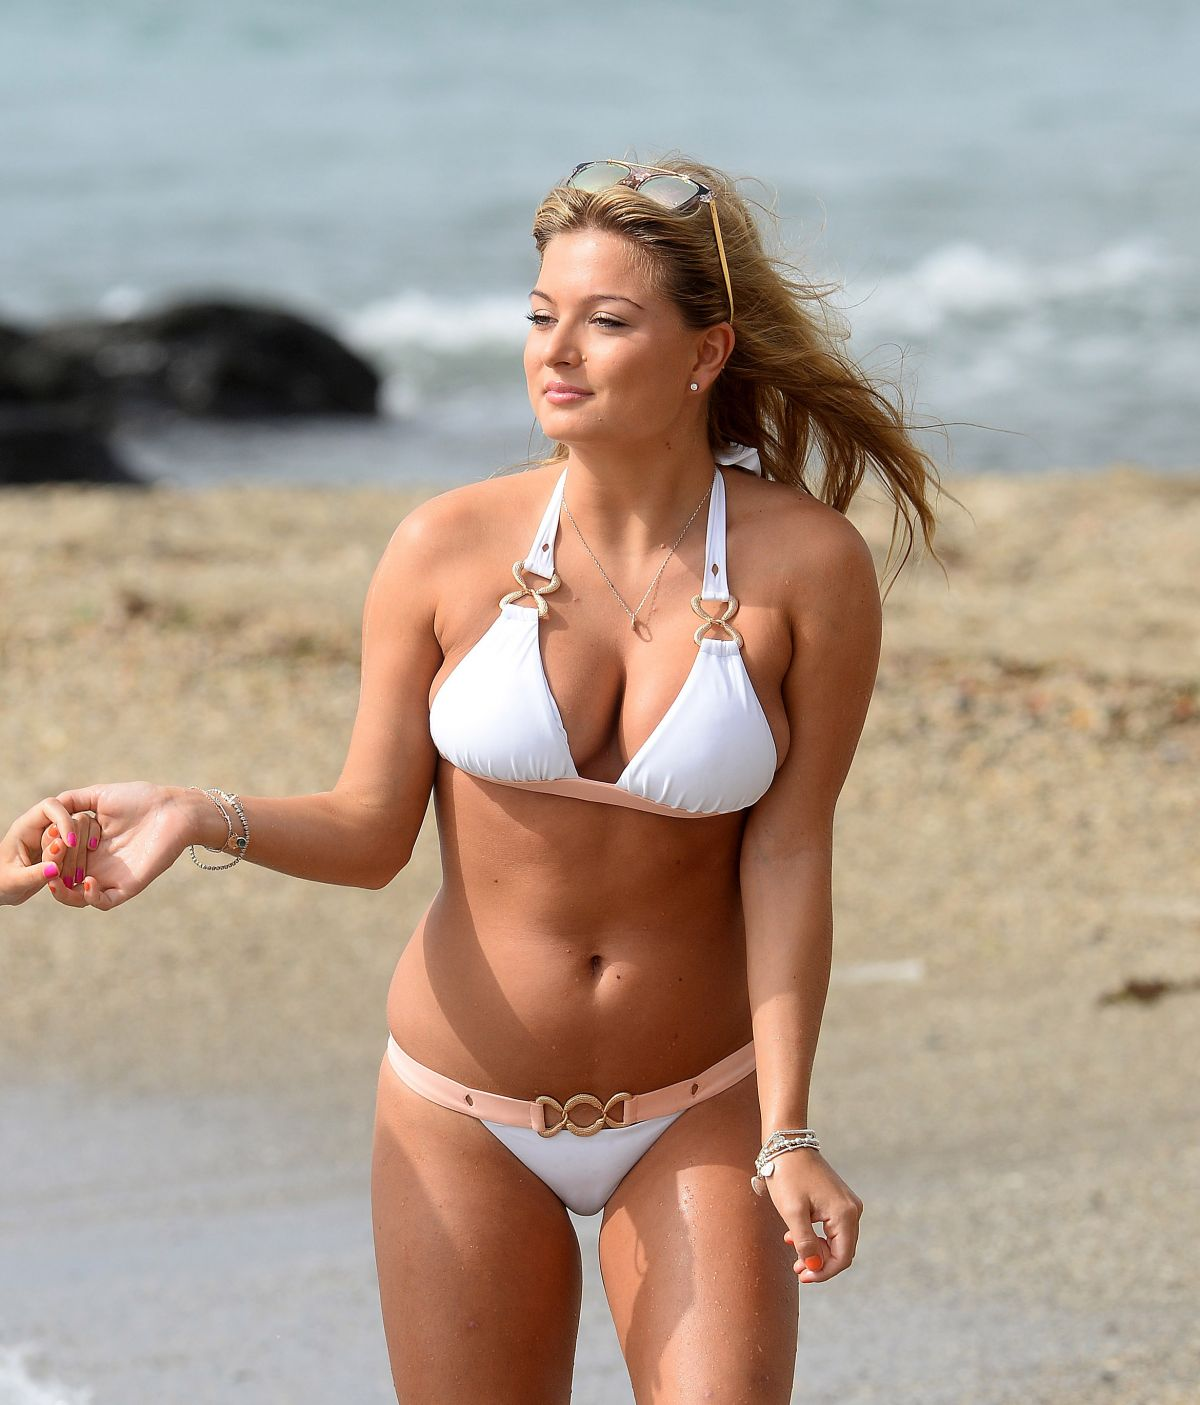 ZARA HOLLAND in Bikini at a Beach in Marbella 08/26/2016